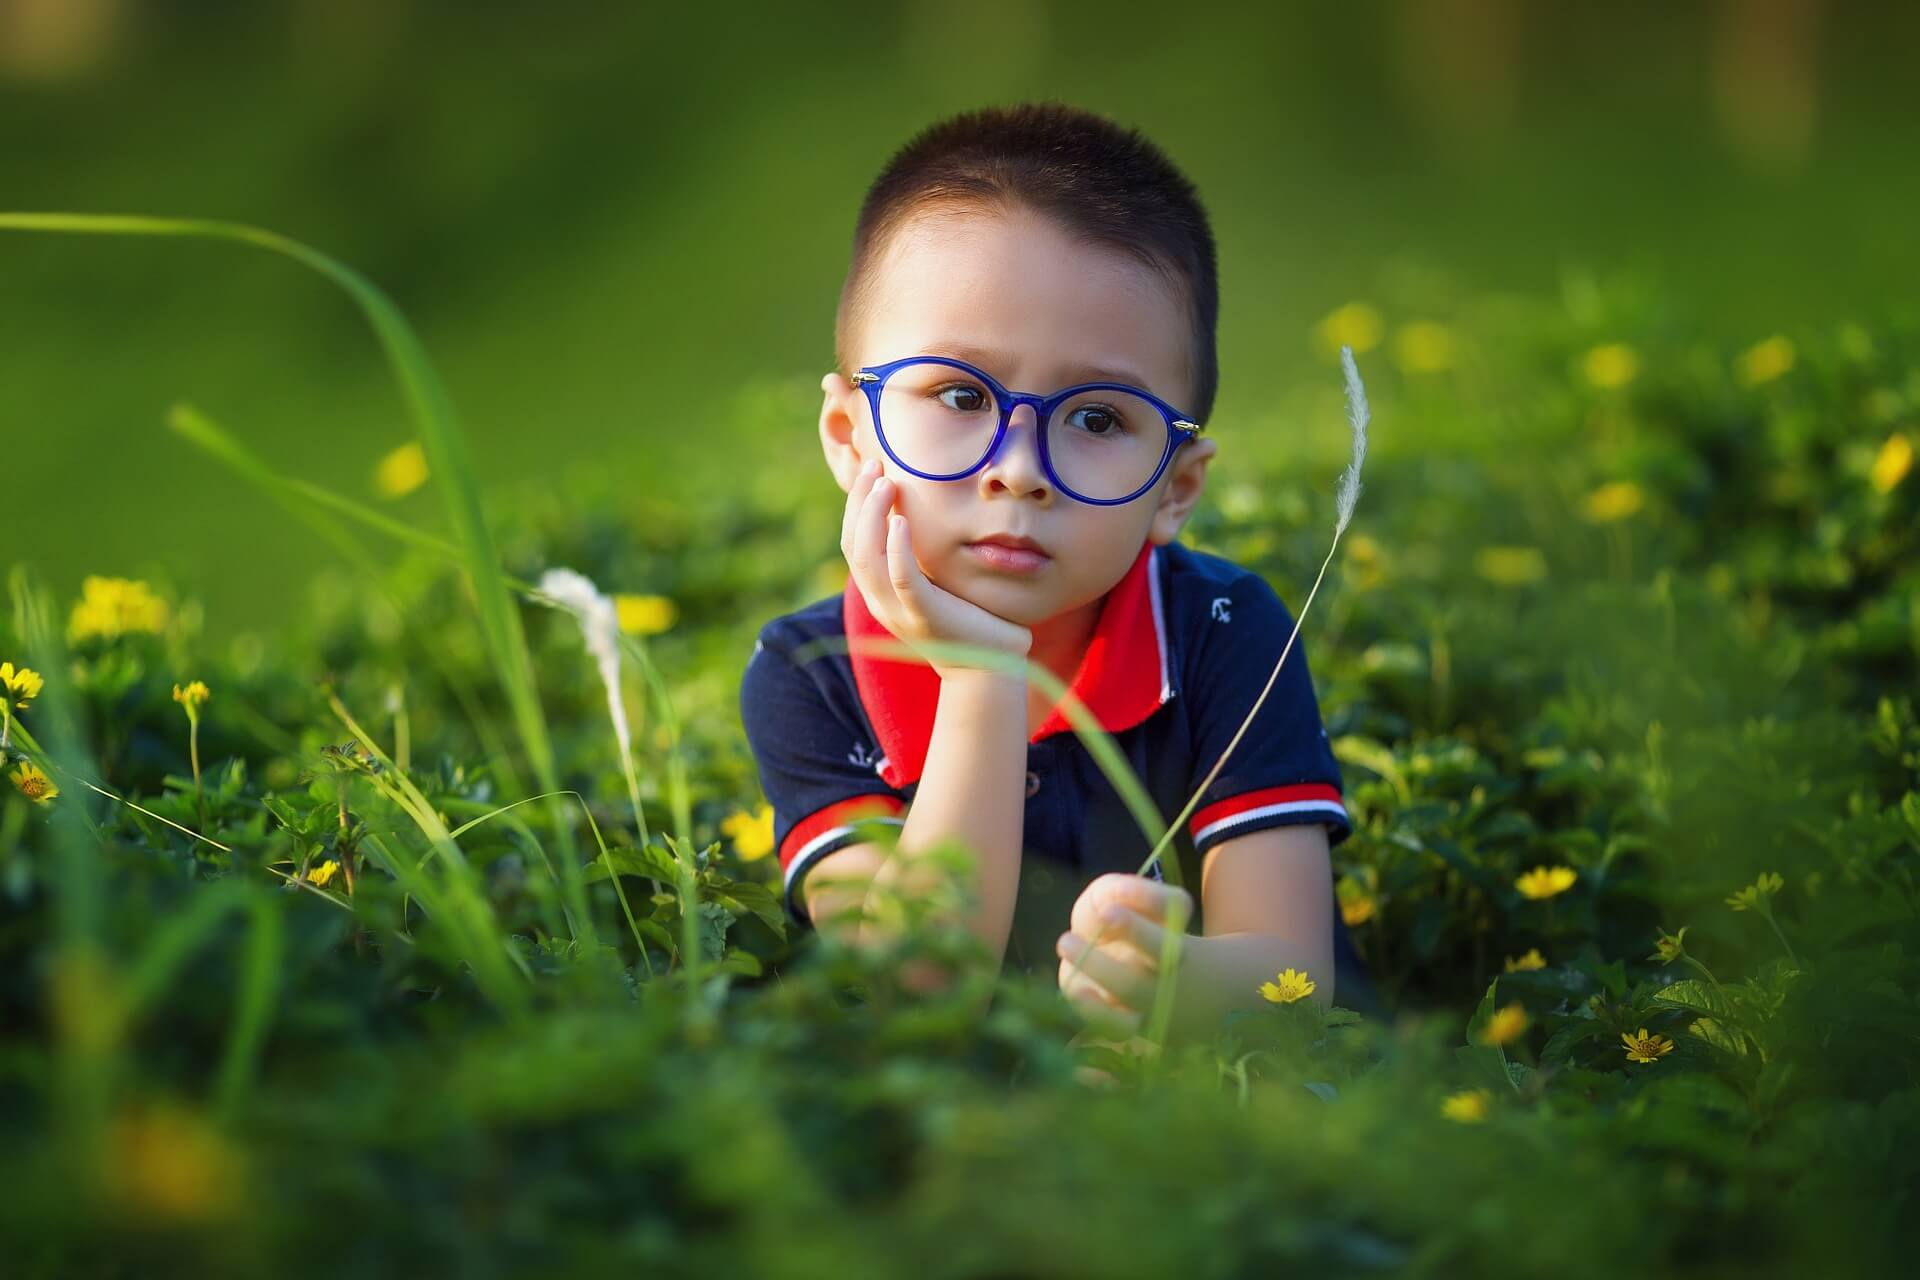 menino de 4 anos entediado no jardim